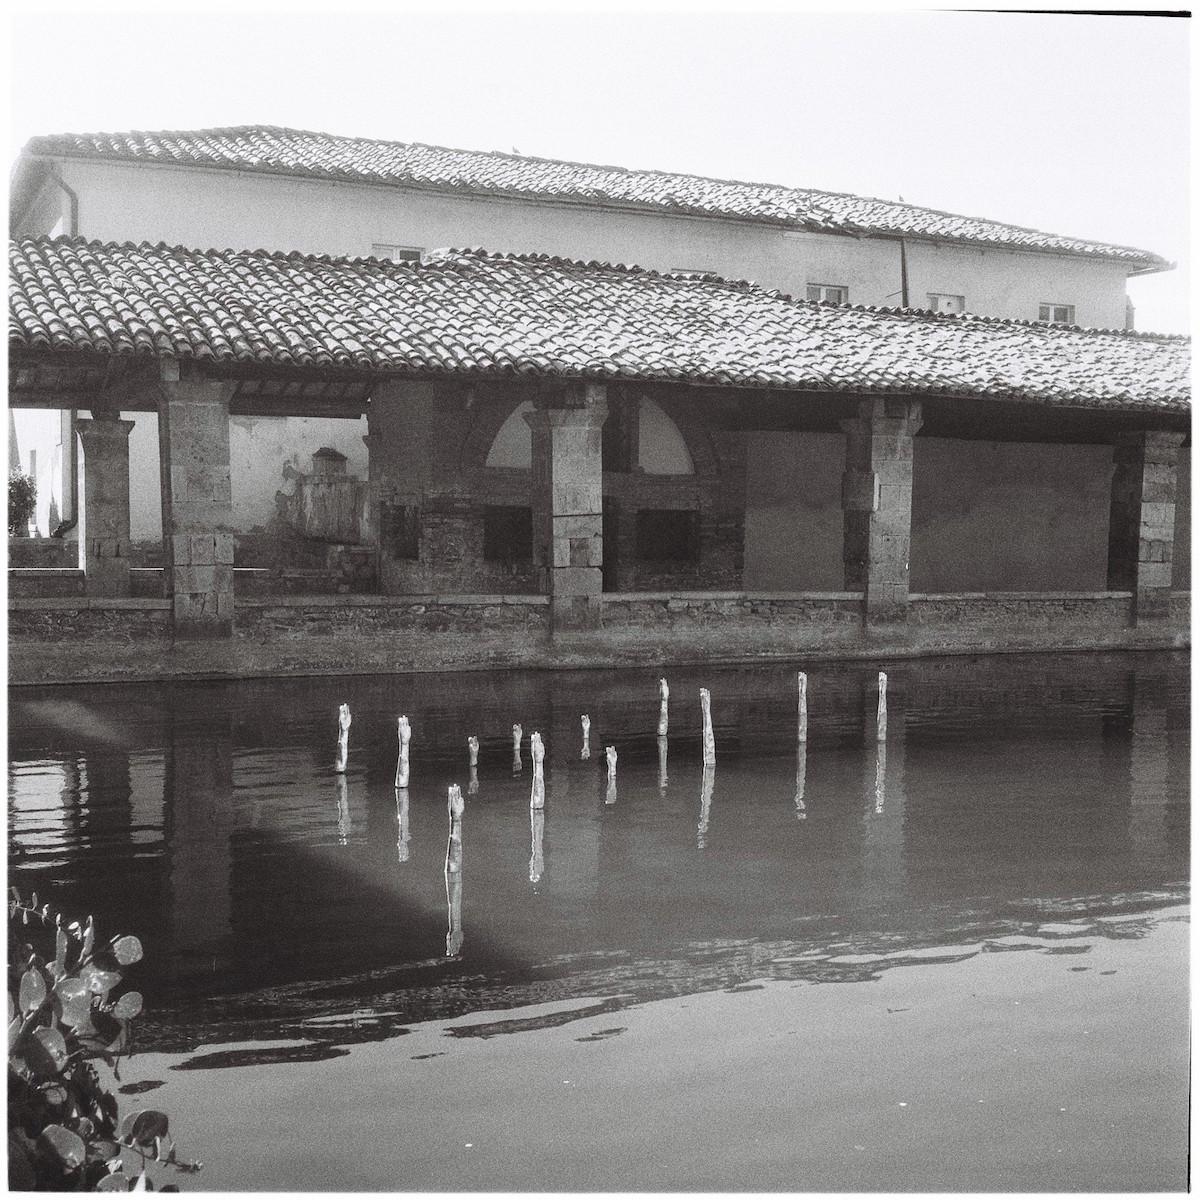 Namsal Siedlecki, Trevis Maponos, 2020, Piazza delle Sorgenti, Bagno Vignoni